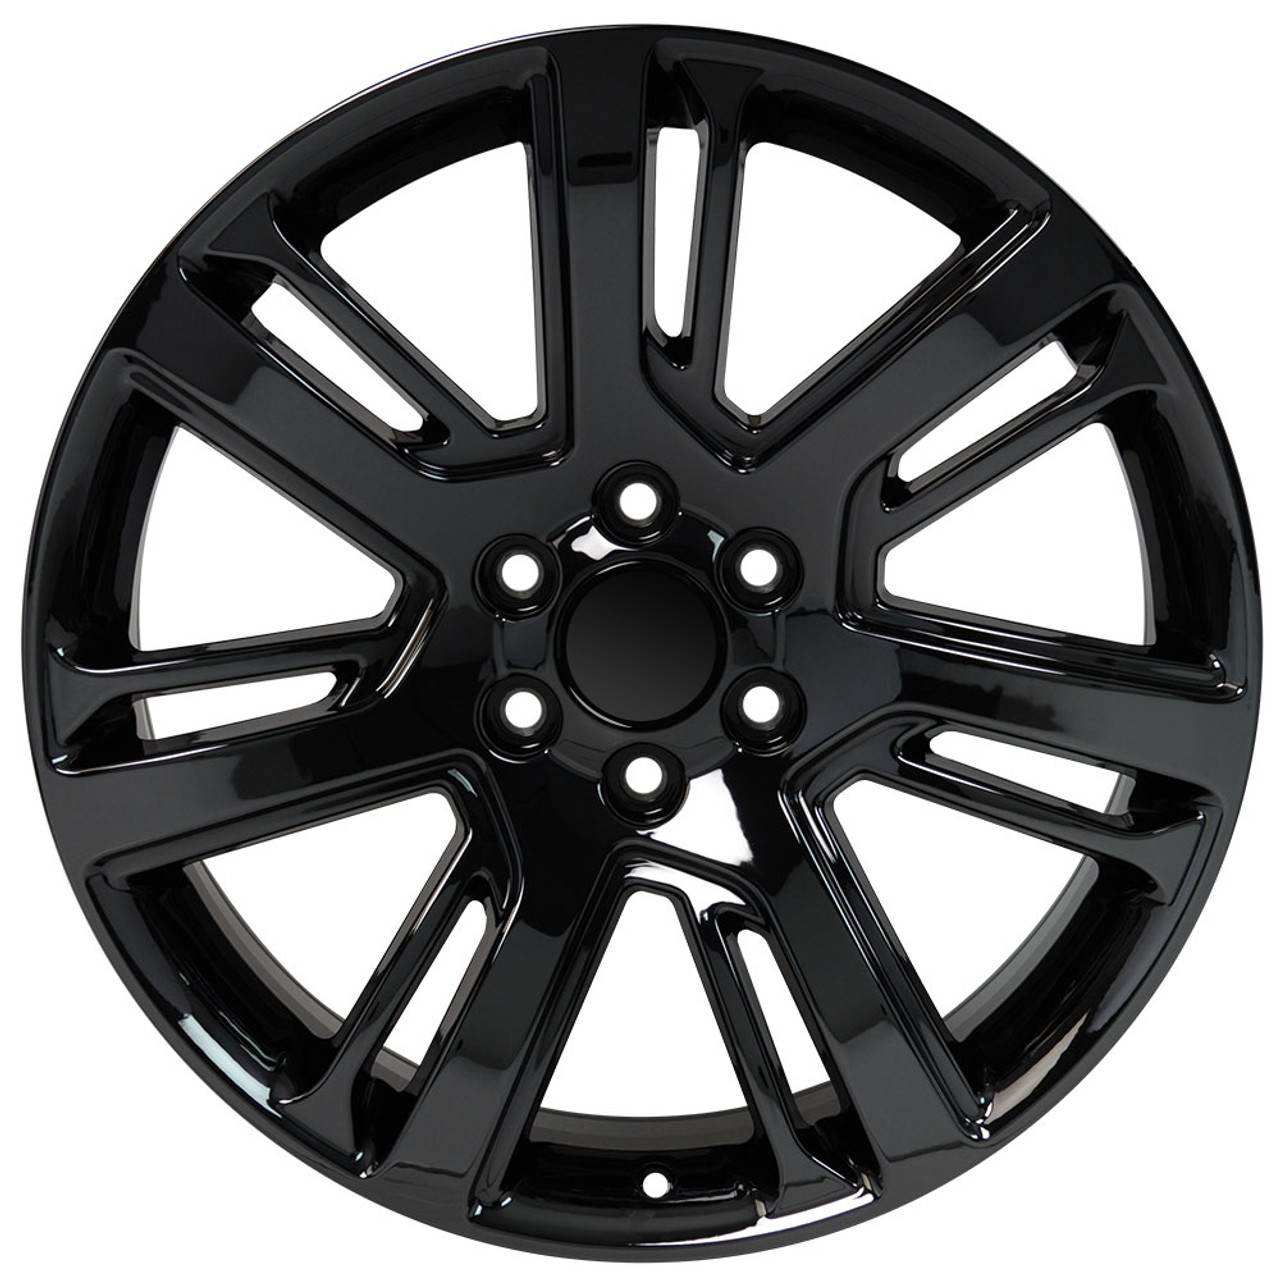 22 cadillac escalade premium style gmc 2015 gloss black wheels set Ford Expedition 22 cadillac escalade premium style gmc 2015 gloss black wheels set of 4 22x9